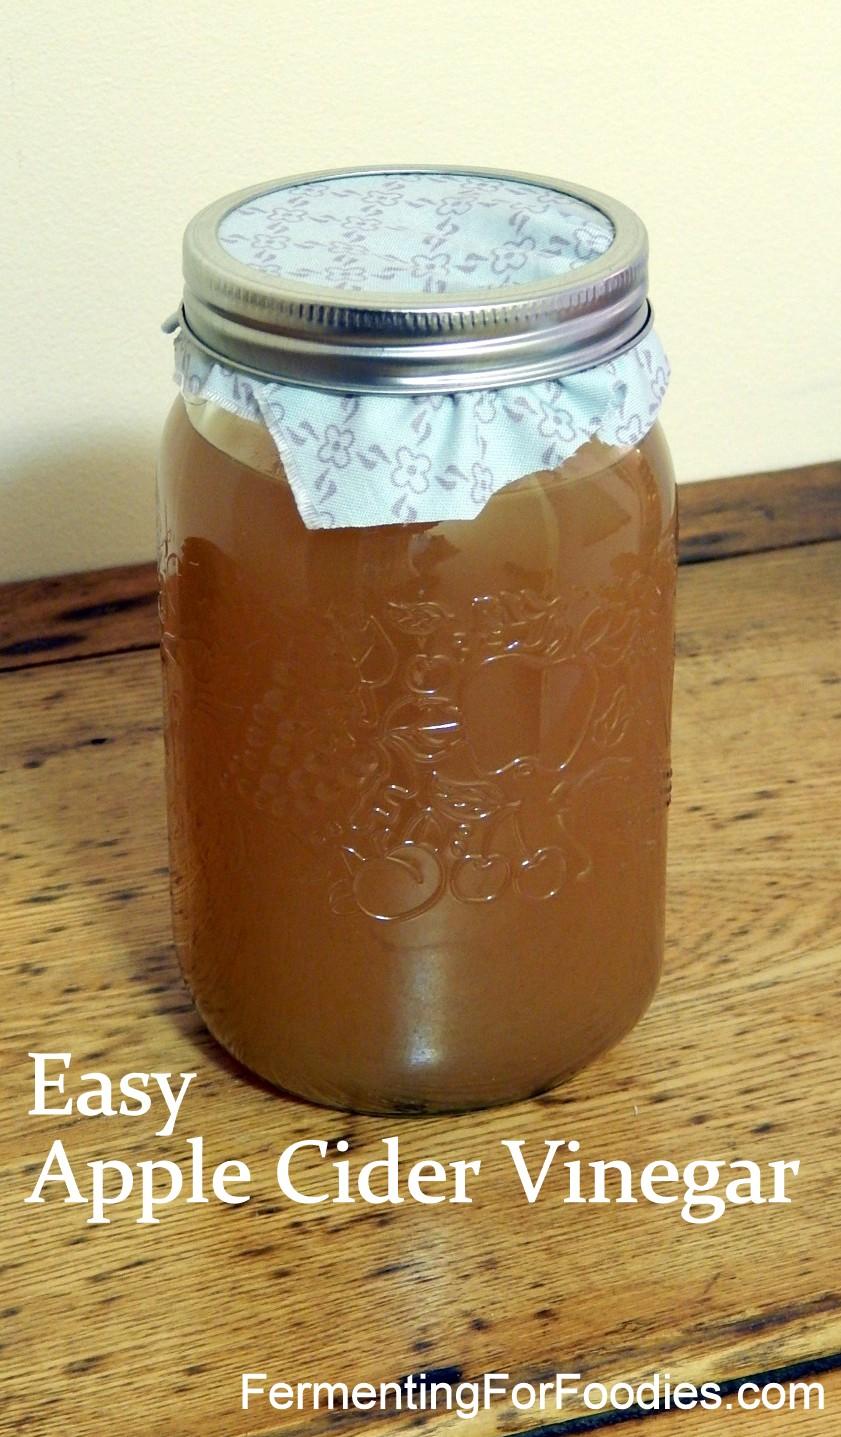 Apple Cider Vinegar made from juice.